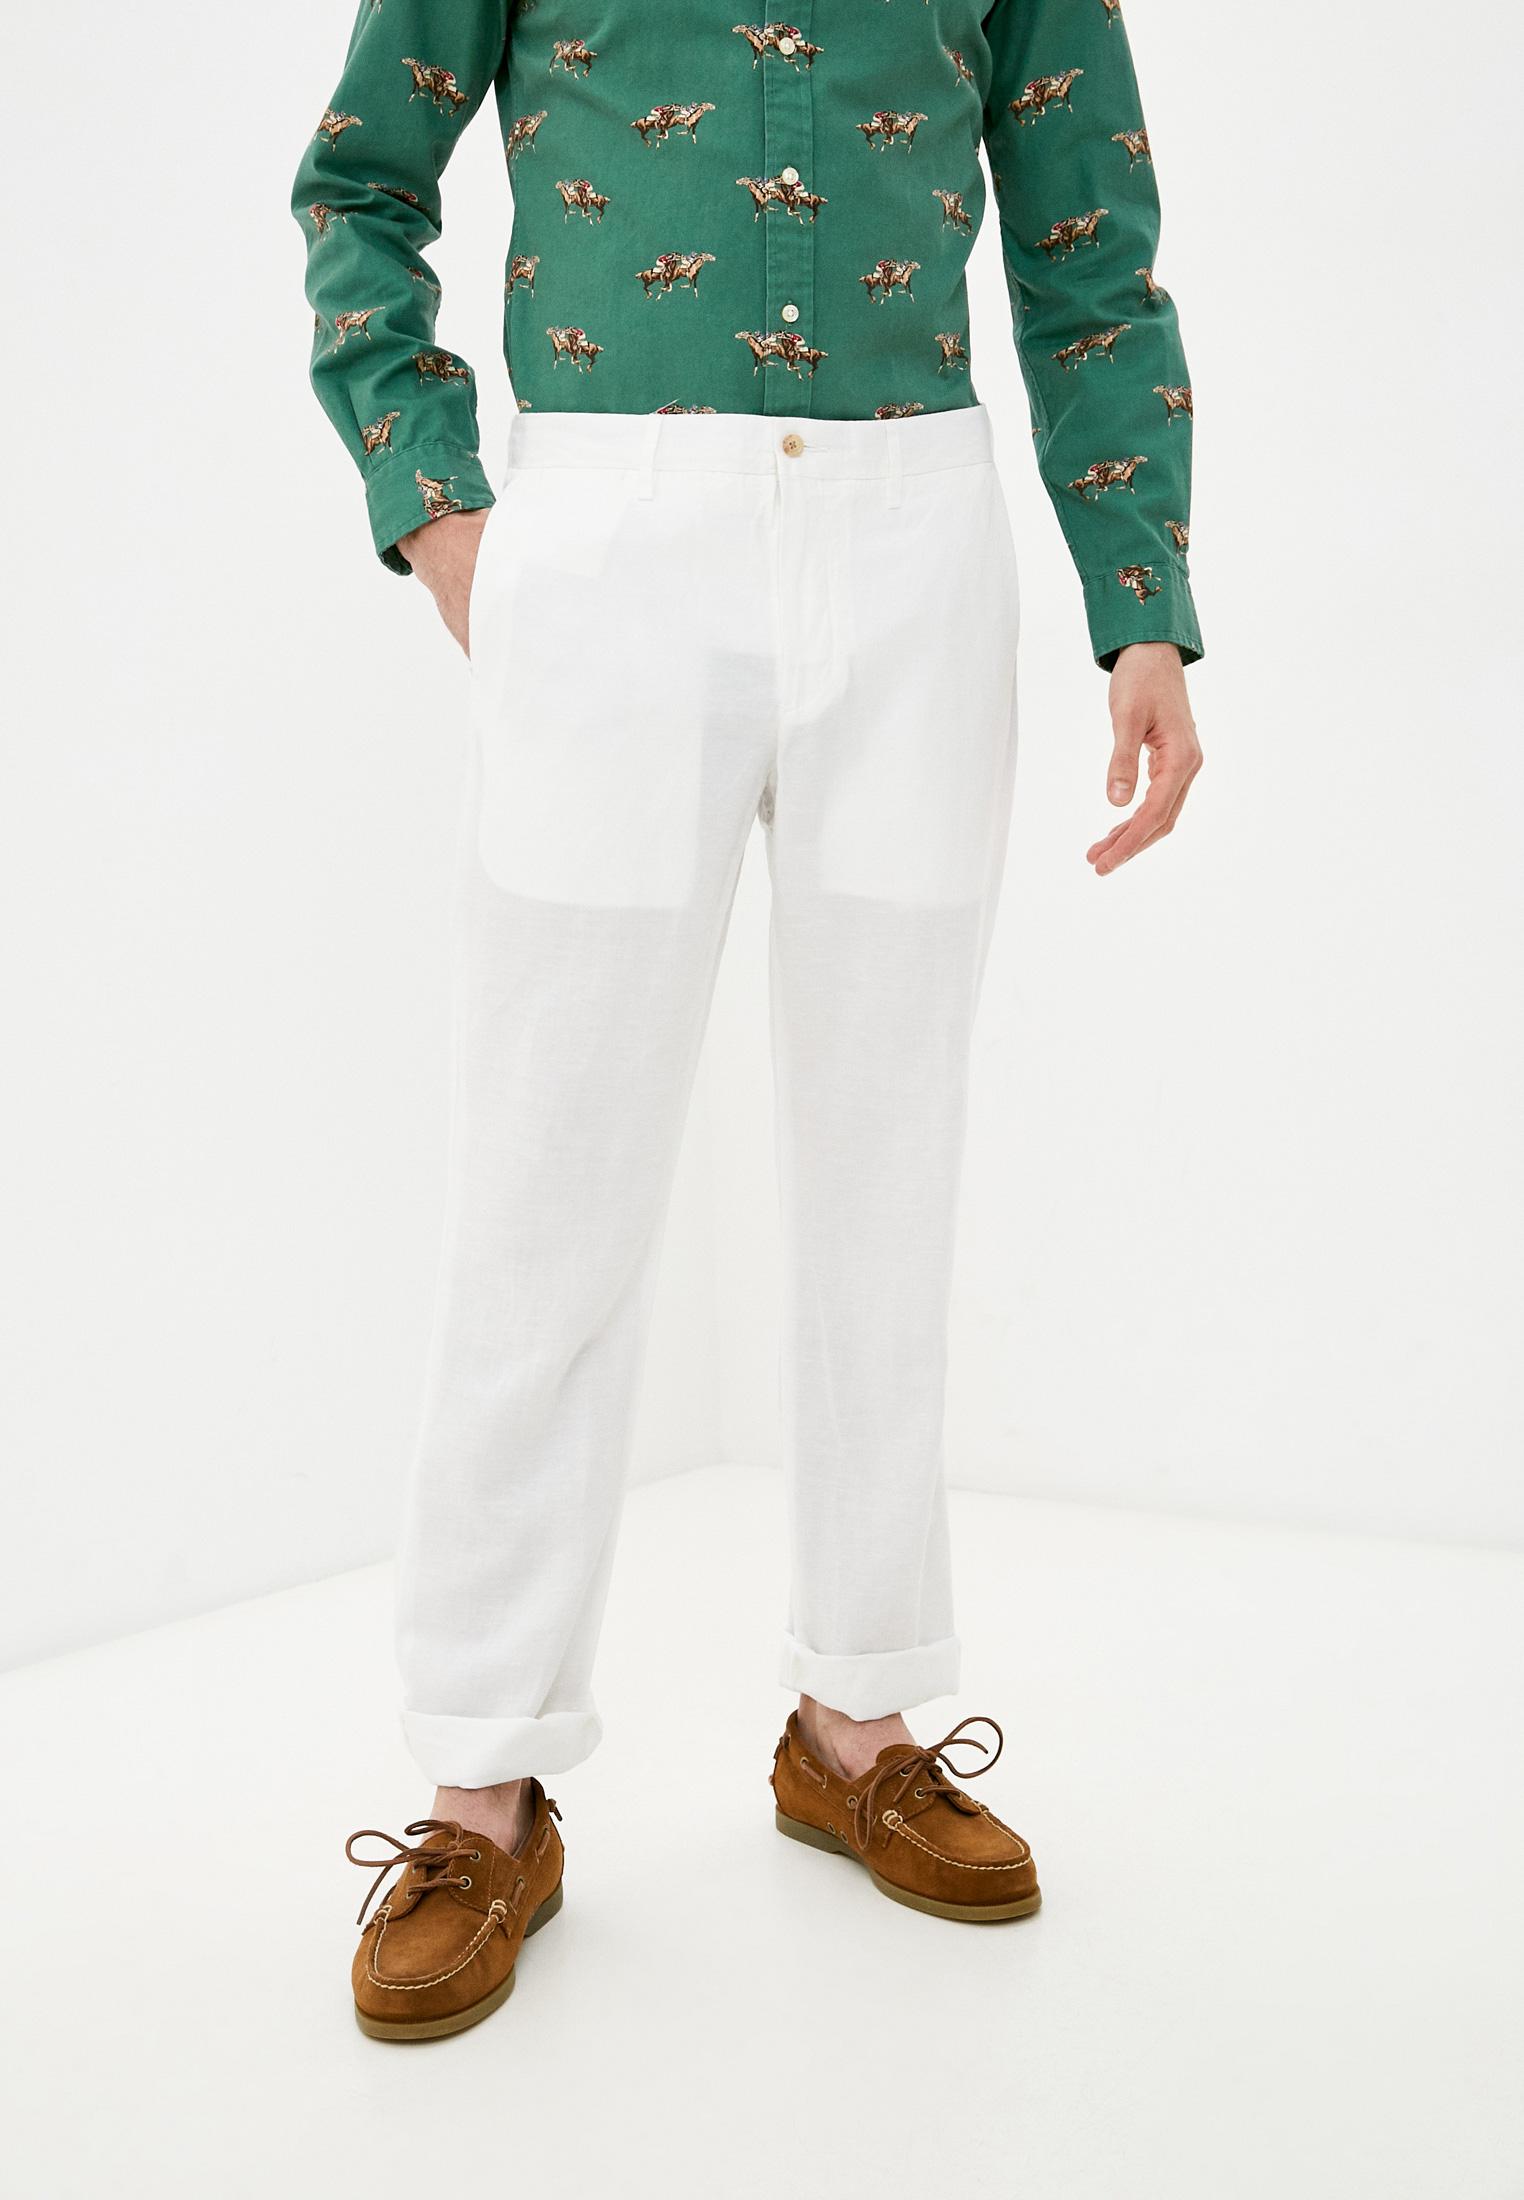 Мужские брюки Polo Ralph Lauren (Поло Ральф Лорен) Брюки Polo Ralph Lauren